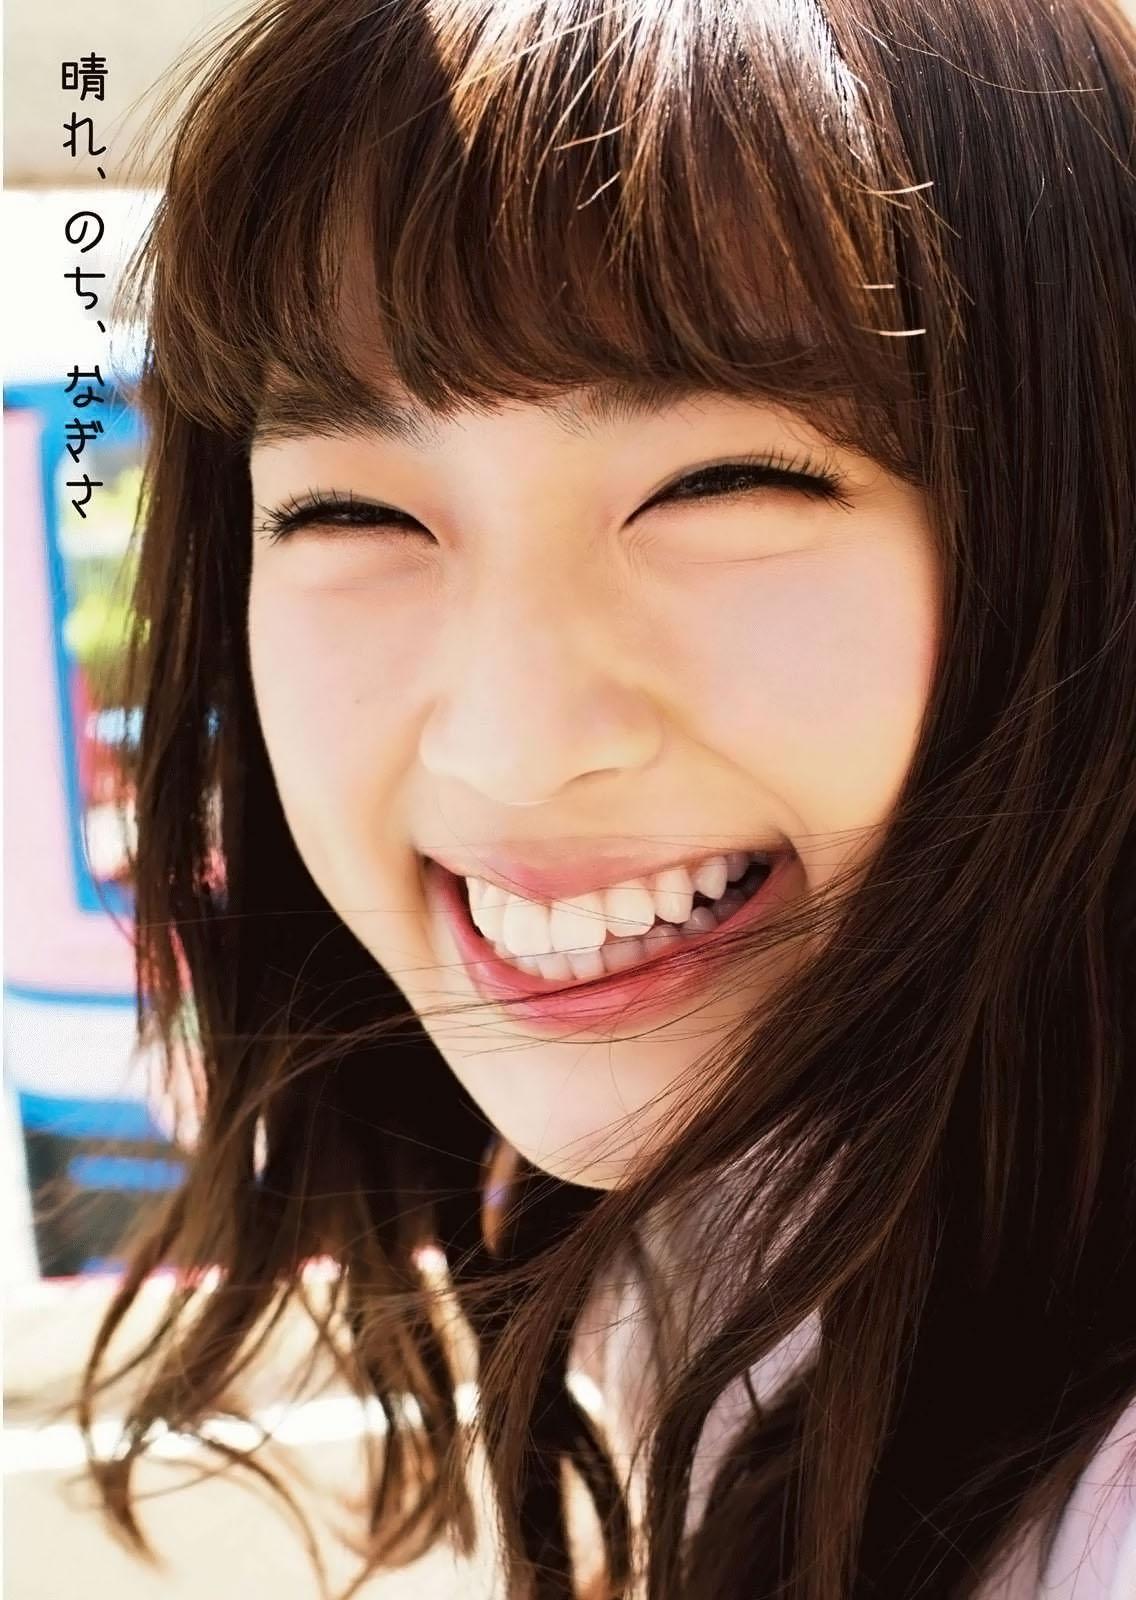 Shibuya Nagisa 渋谷凪咲 NMB48, Manga Action No.12 2016 Kindle Edition Gravure